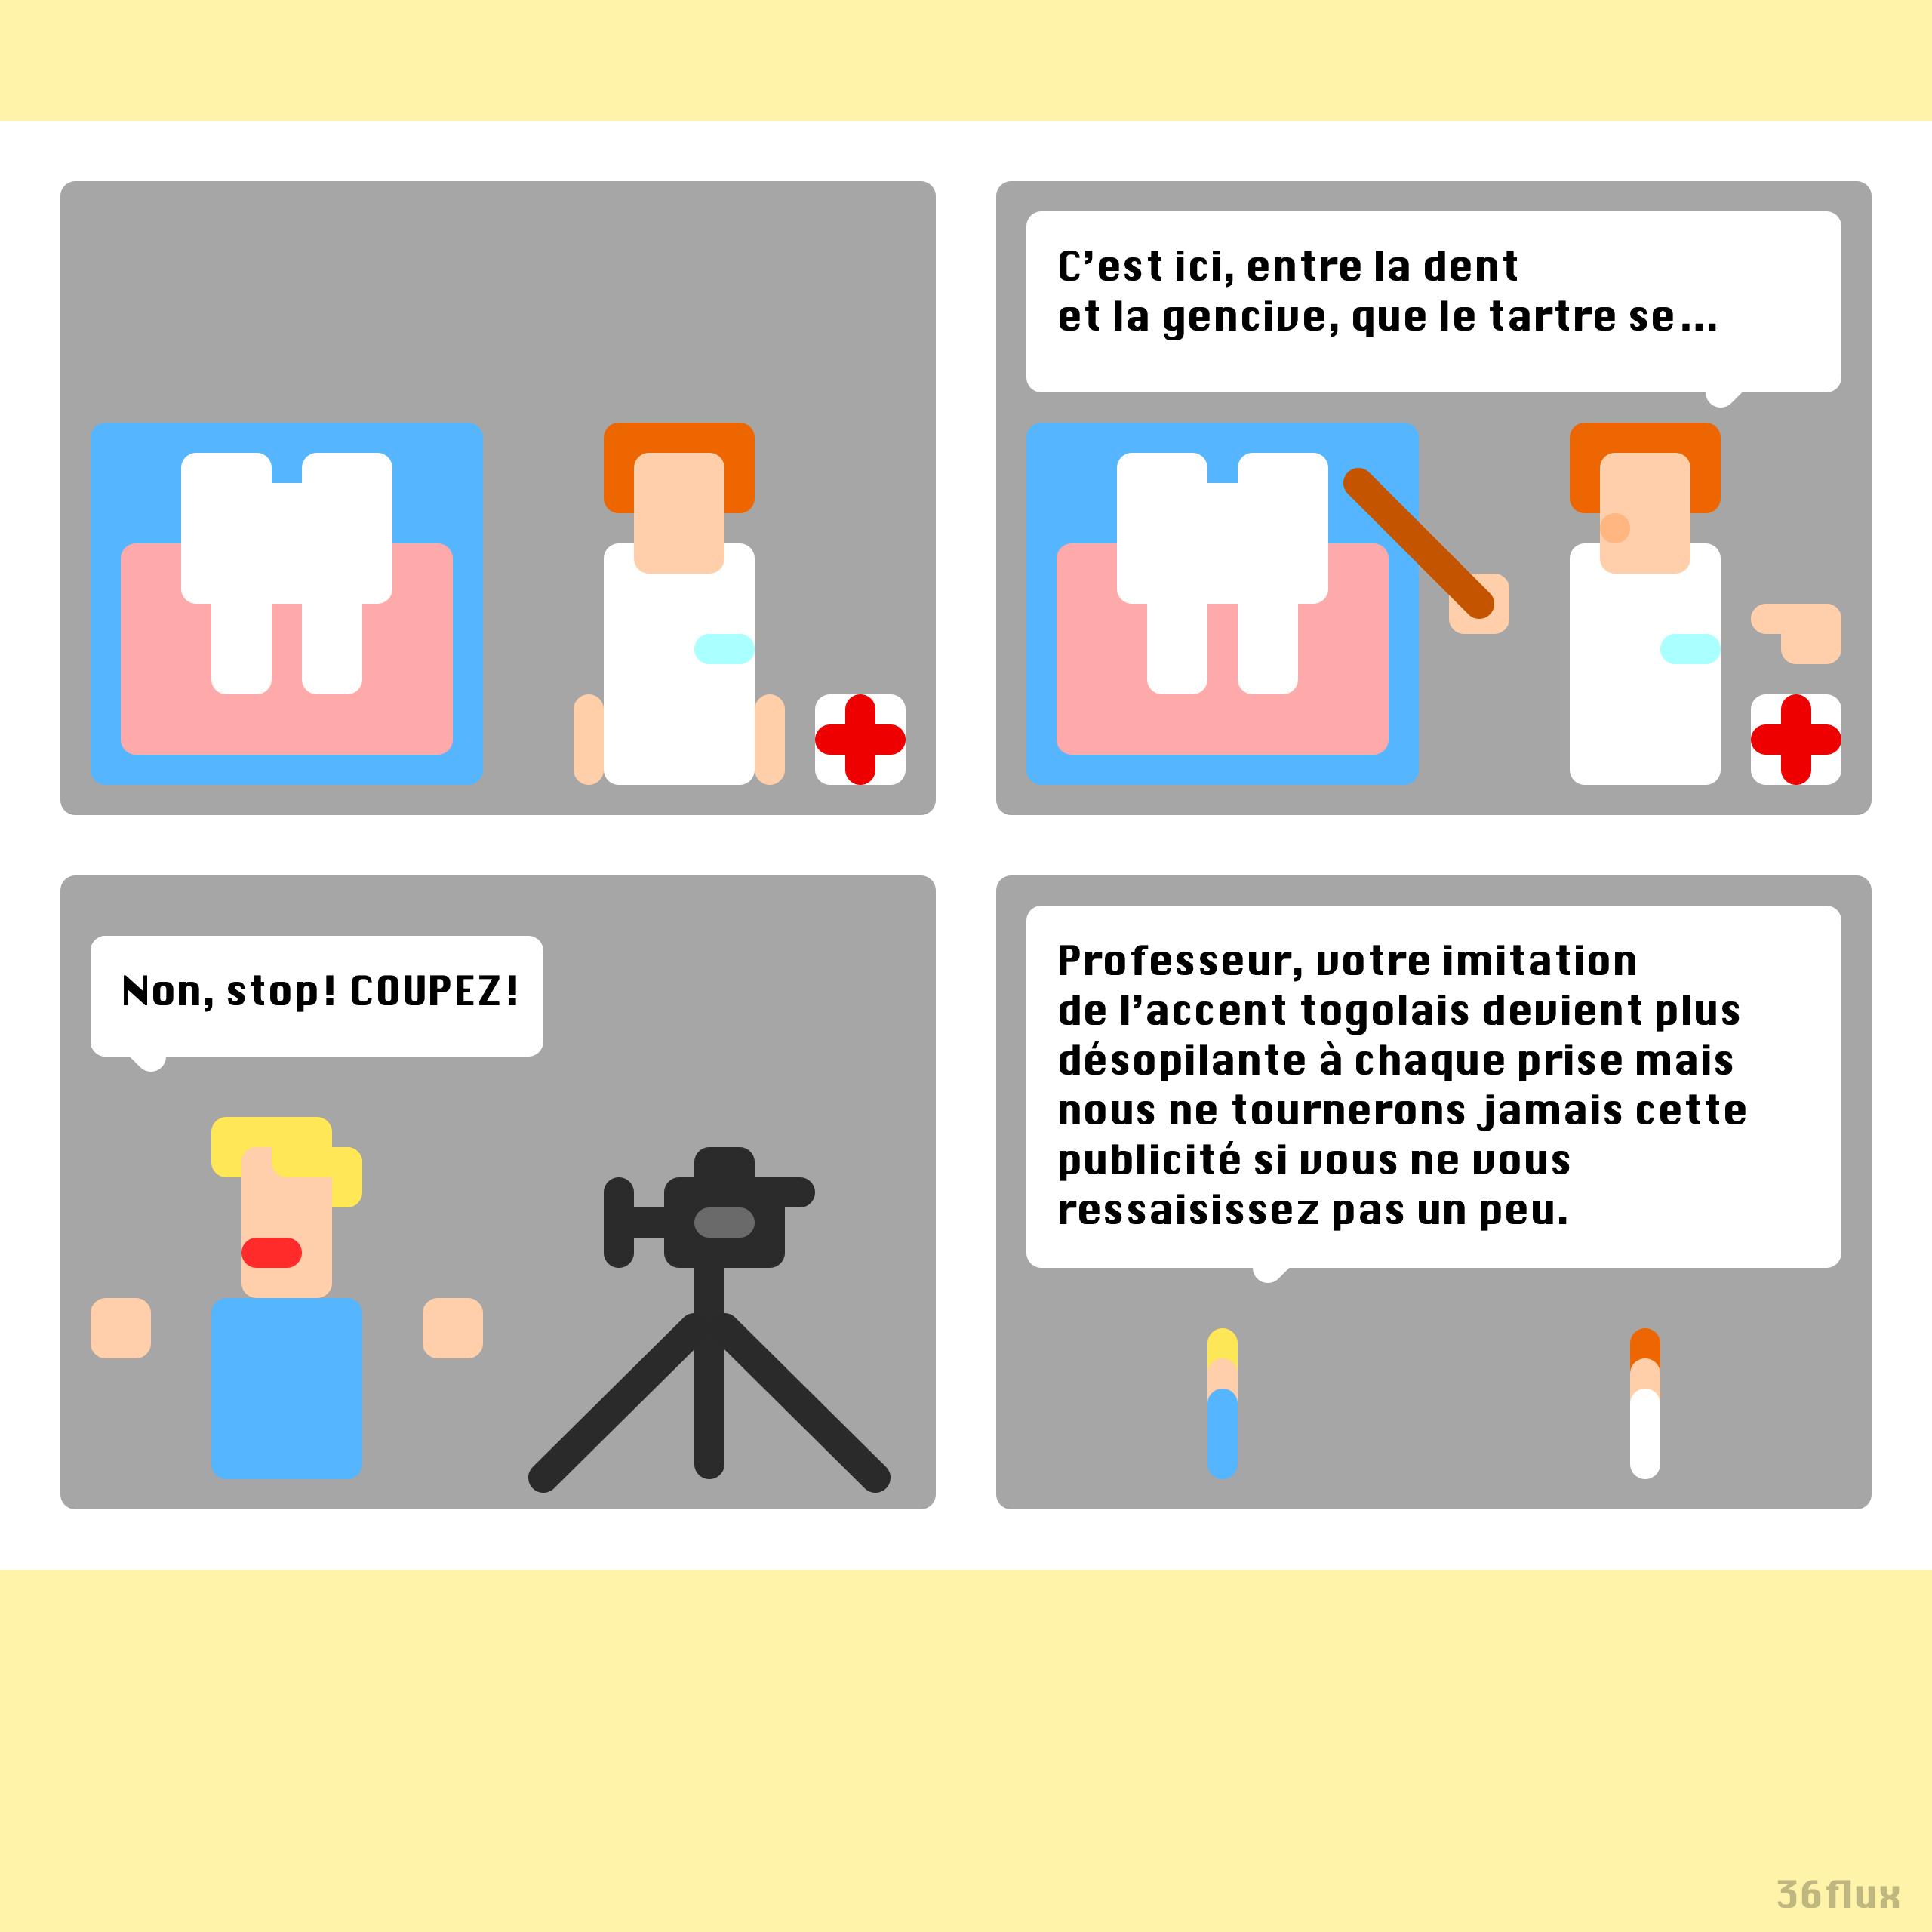 pixelart gencive